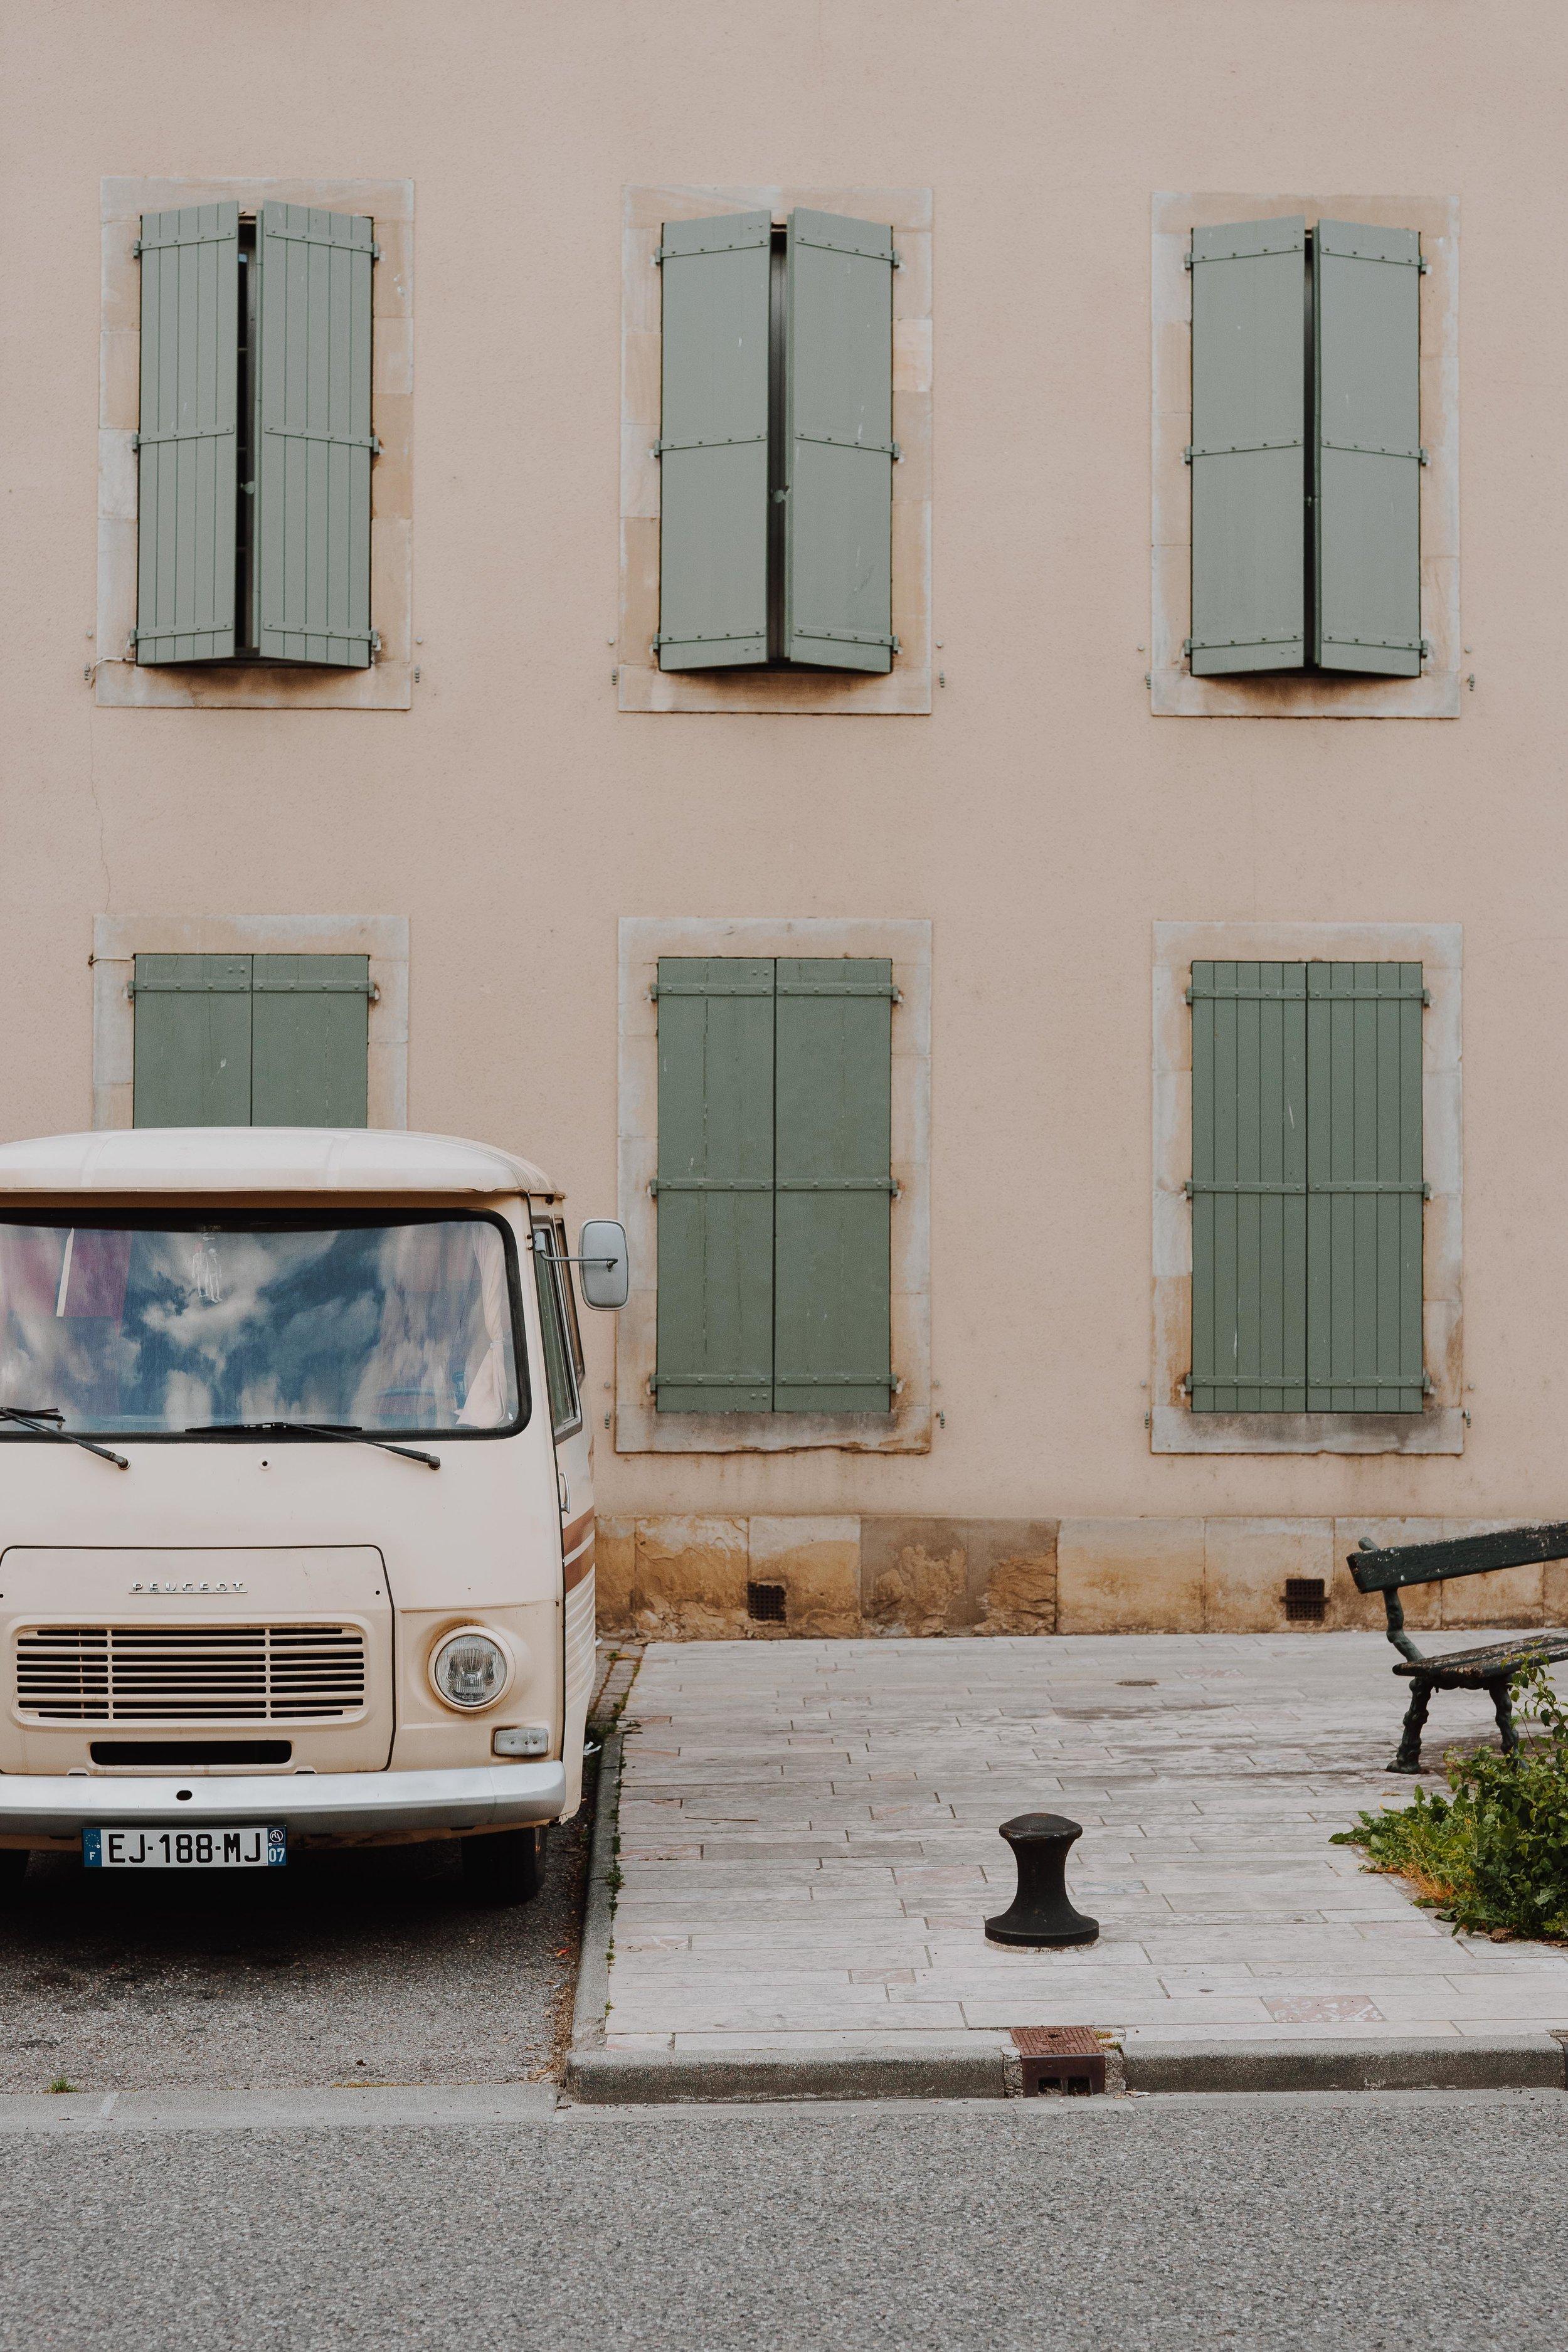 ASROSENVINGE_AtoutFrance_Occitanie_Toulouse_LowRes-217.jpg